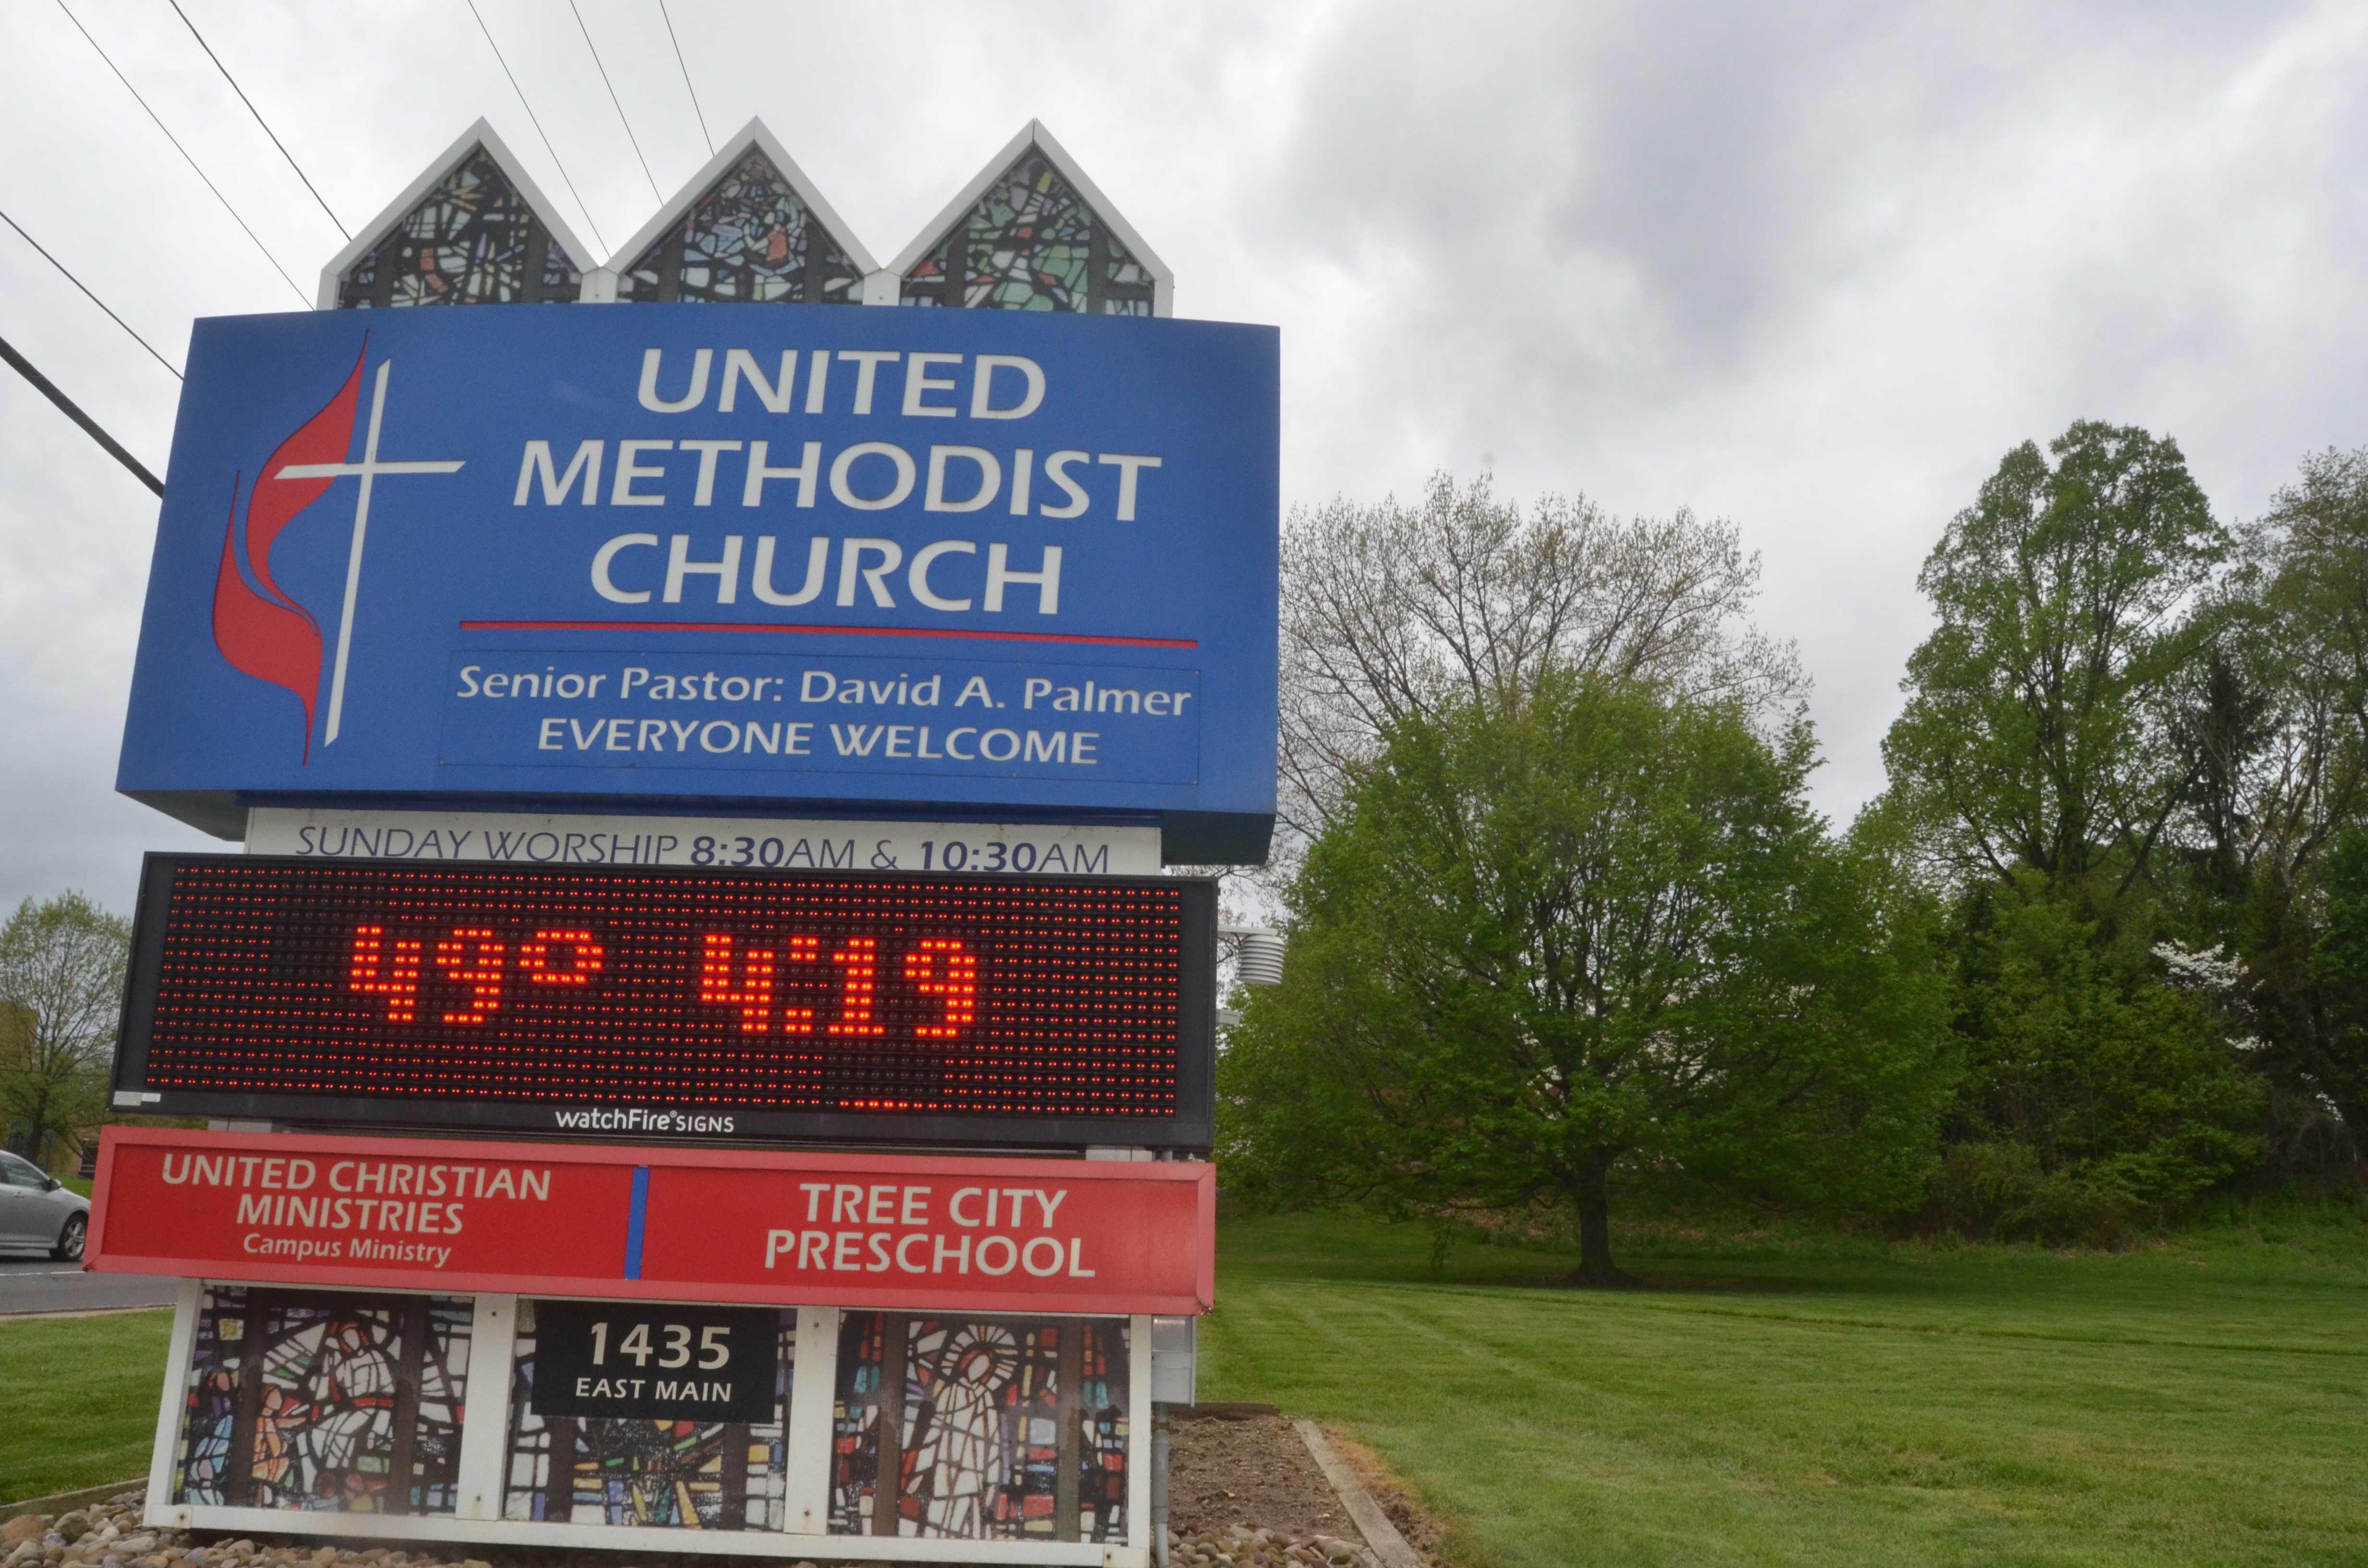 from Eduardo united methodist church gay agenda